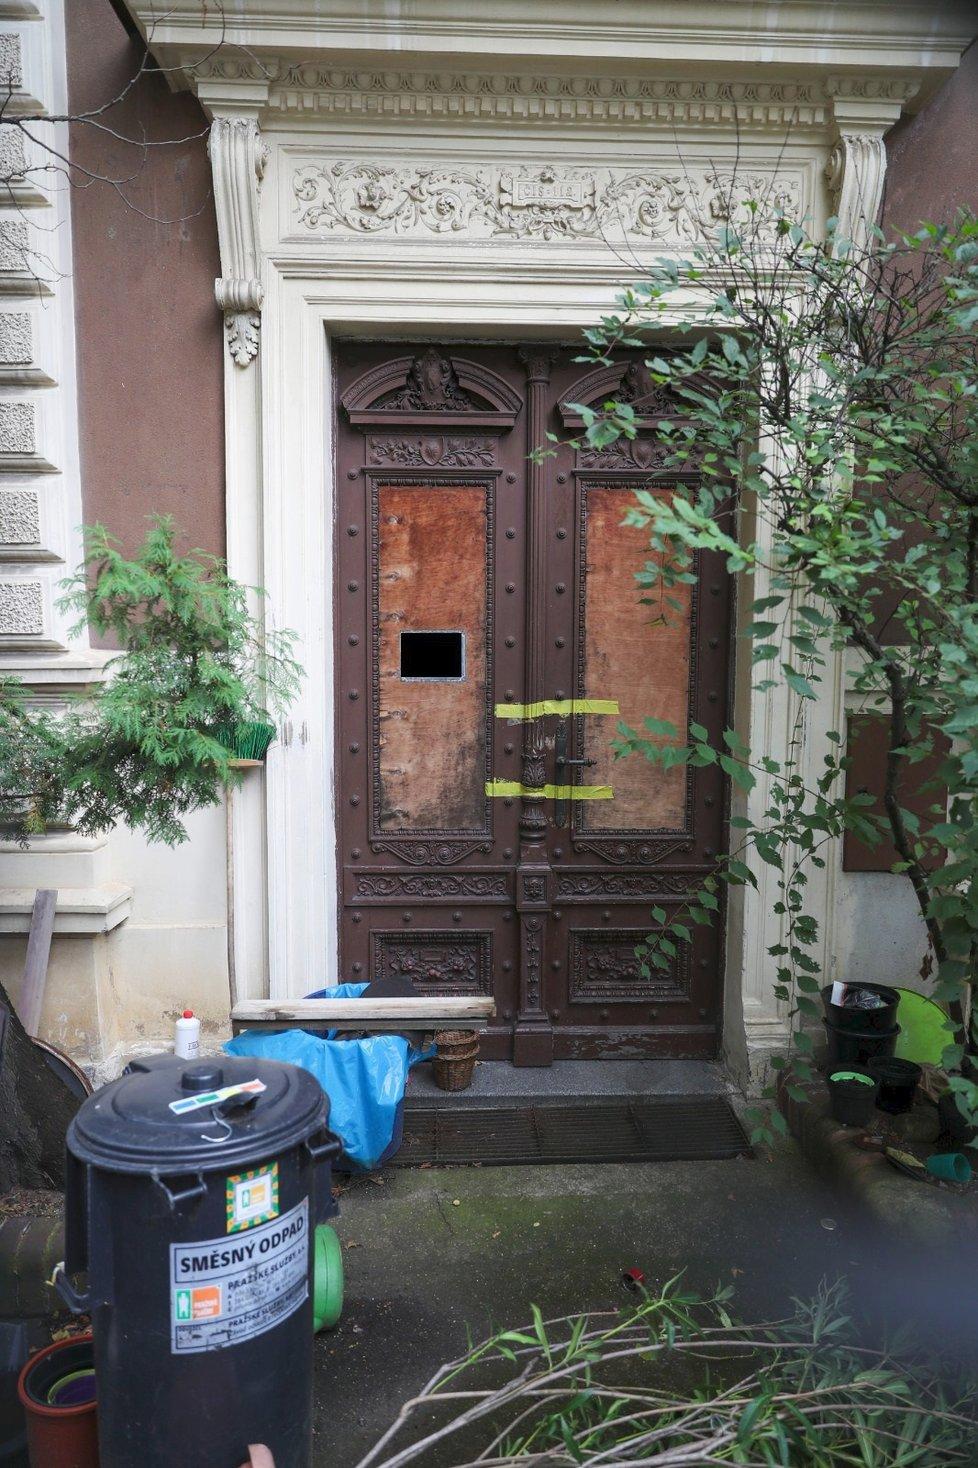 V této vile v Praze 6 Marie a Přemysl spolu dlouhodobě žili.